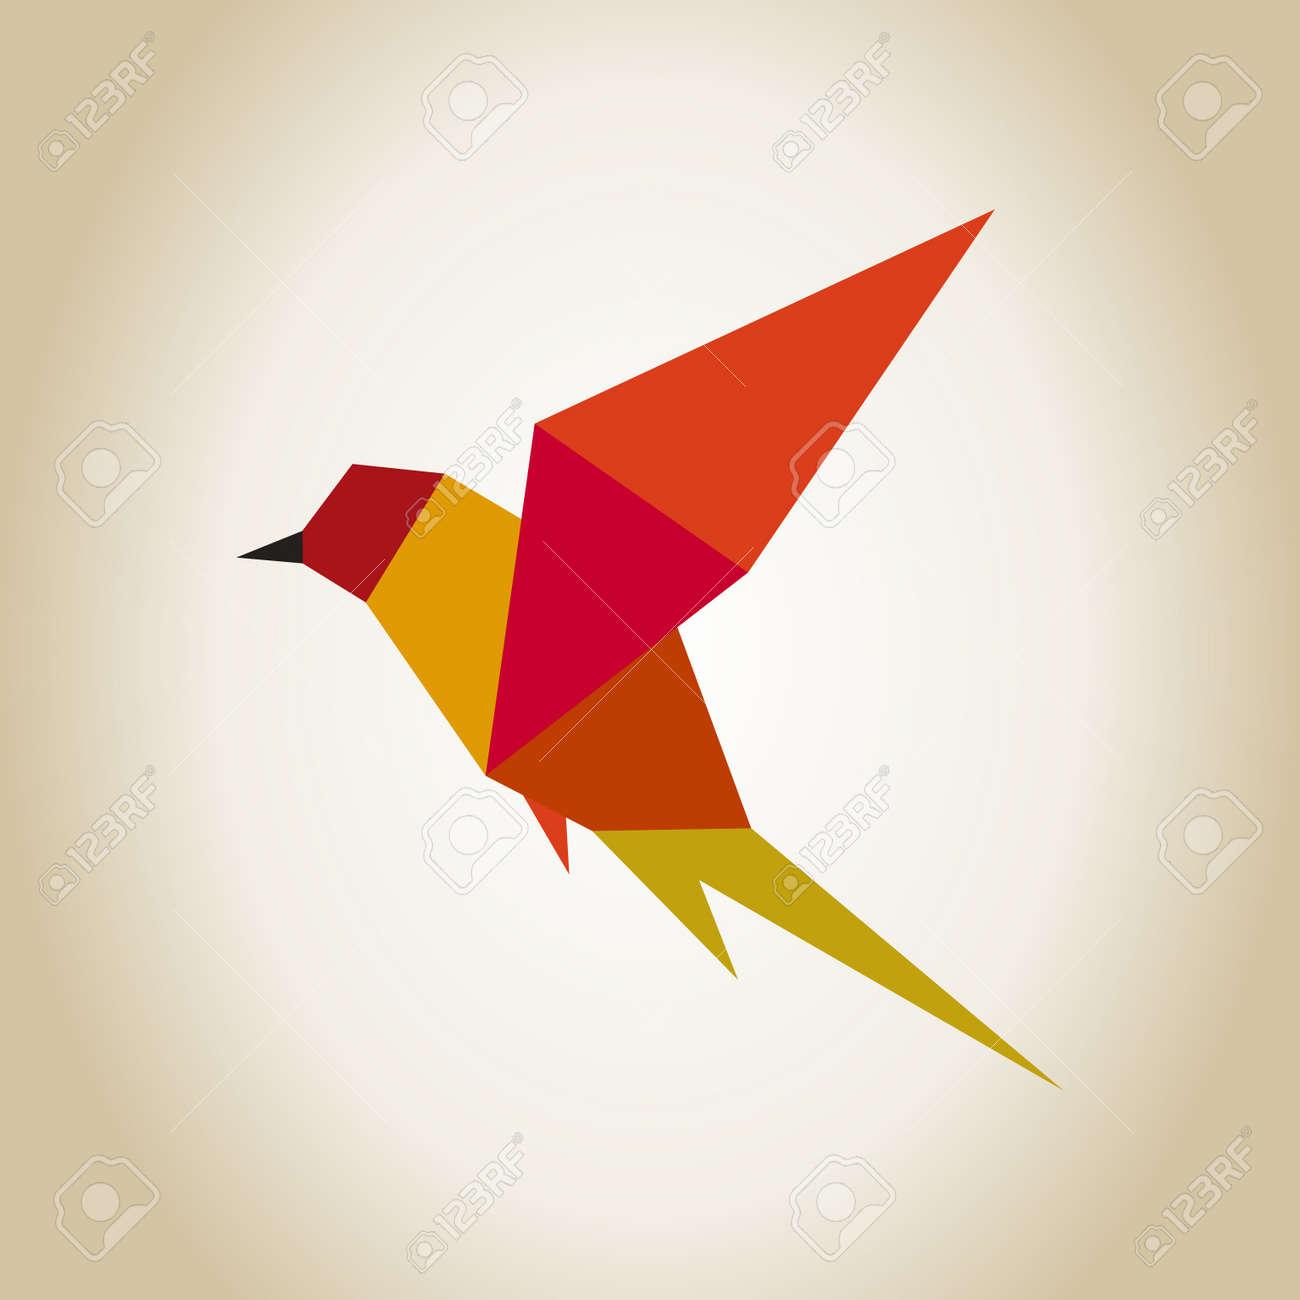 abstraction a bird in flight a vector illustration royalty free